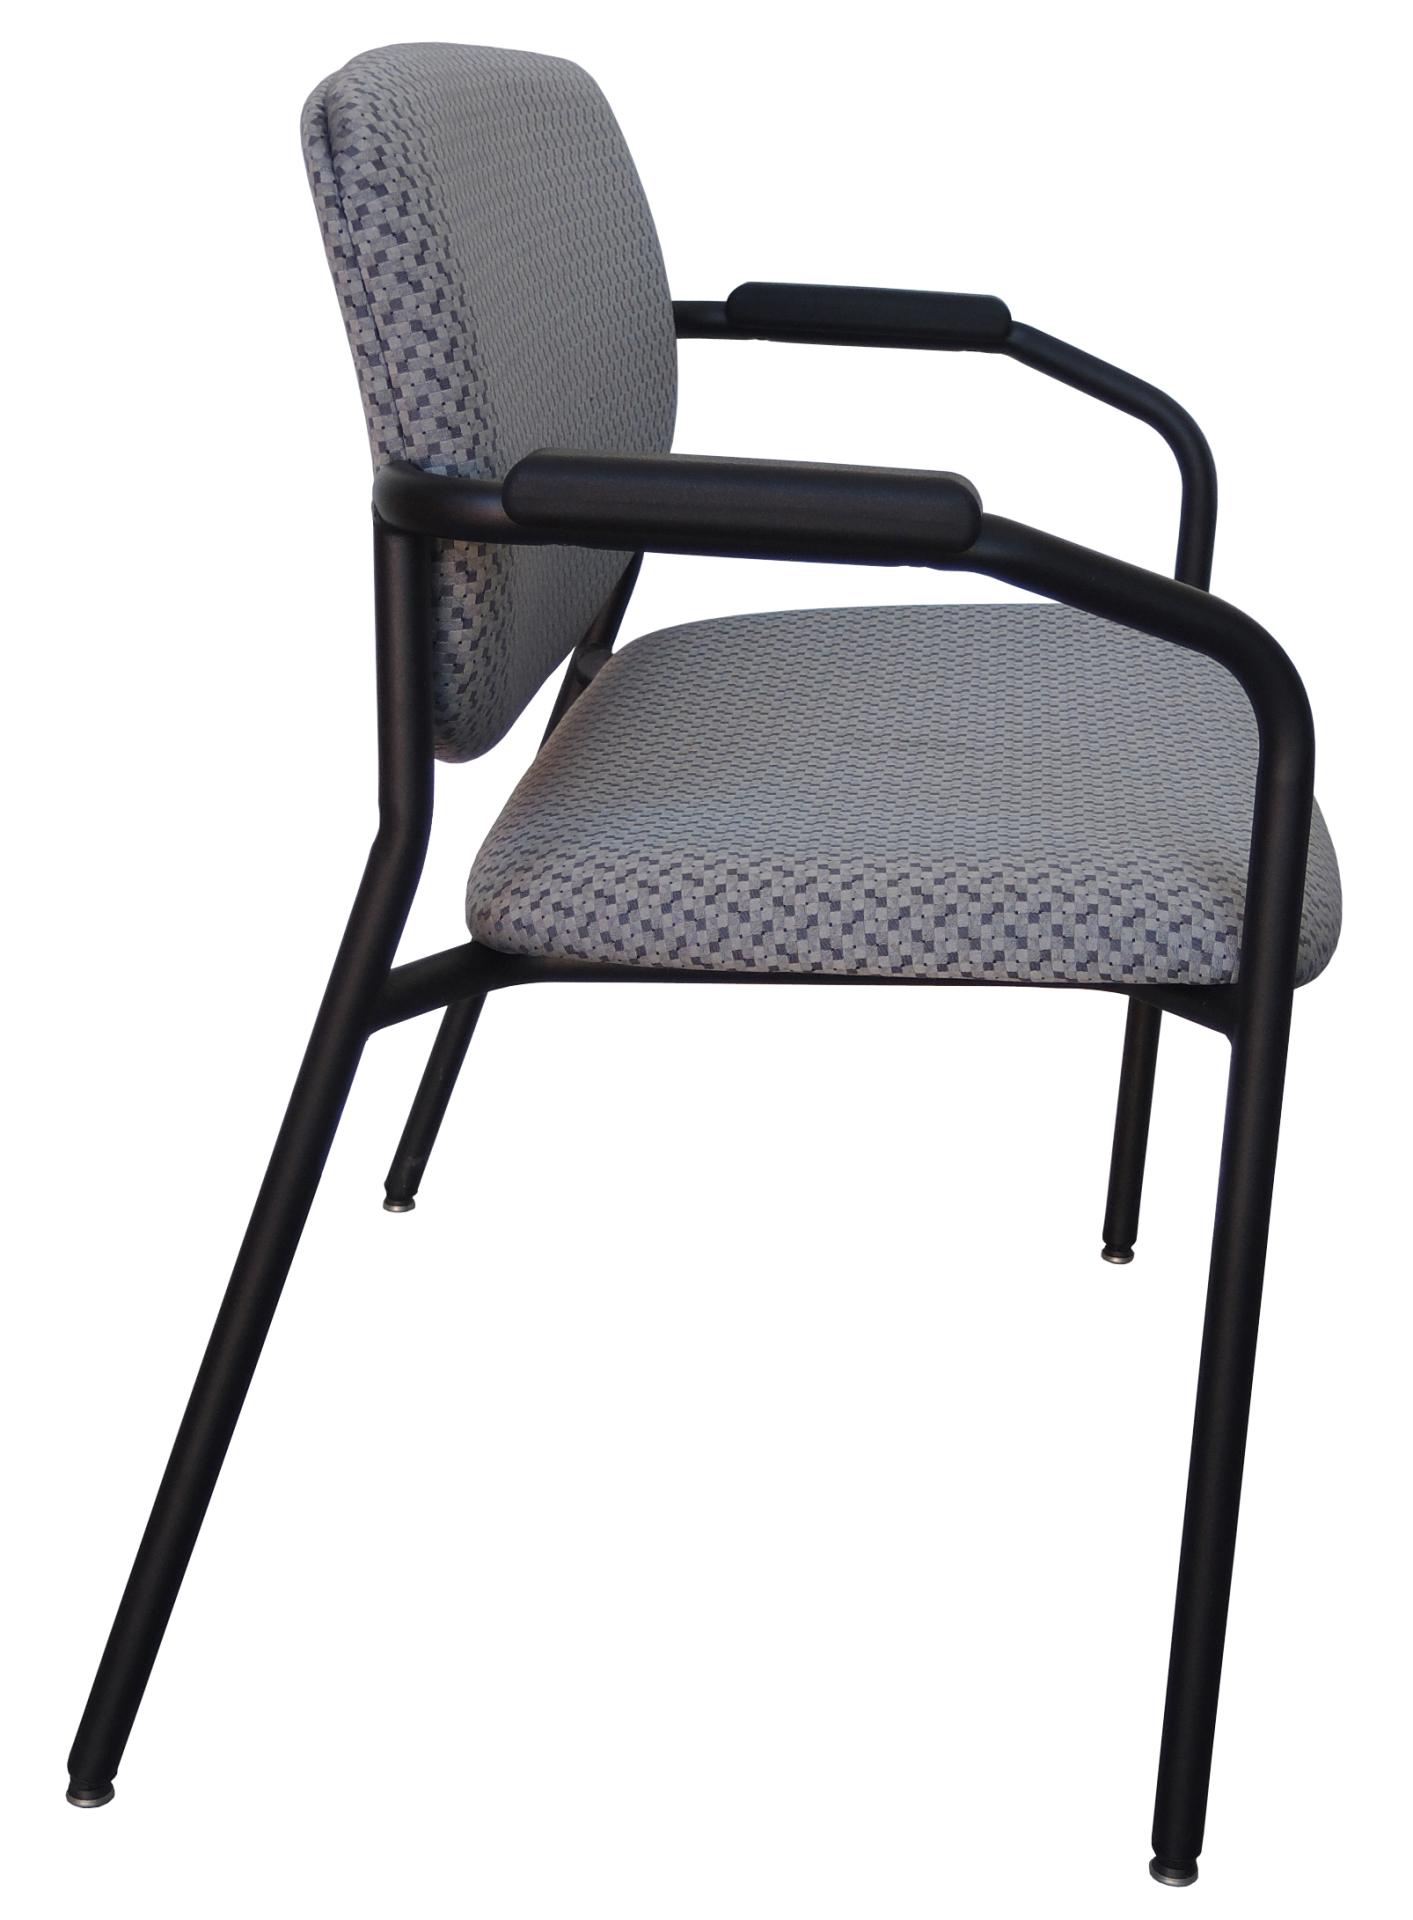 Direct Ergonomics | Sydney Office Furniture | Ergonomic Furniture | Ergonomic Seating | Visitor Chair | Stax Barry